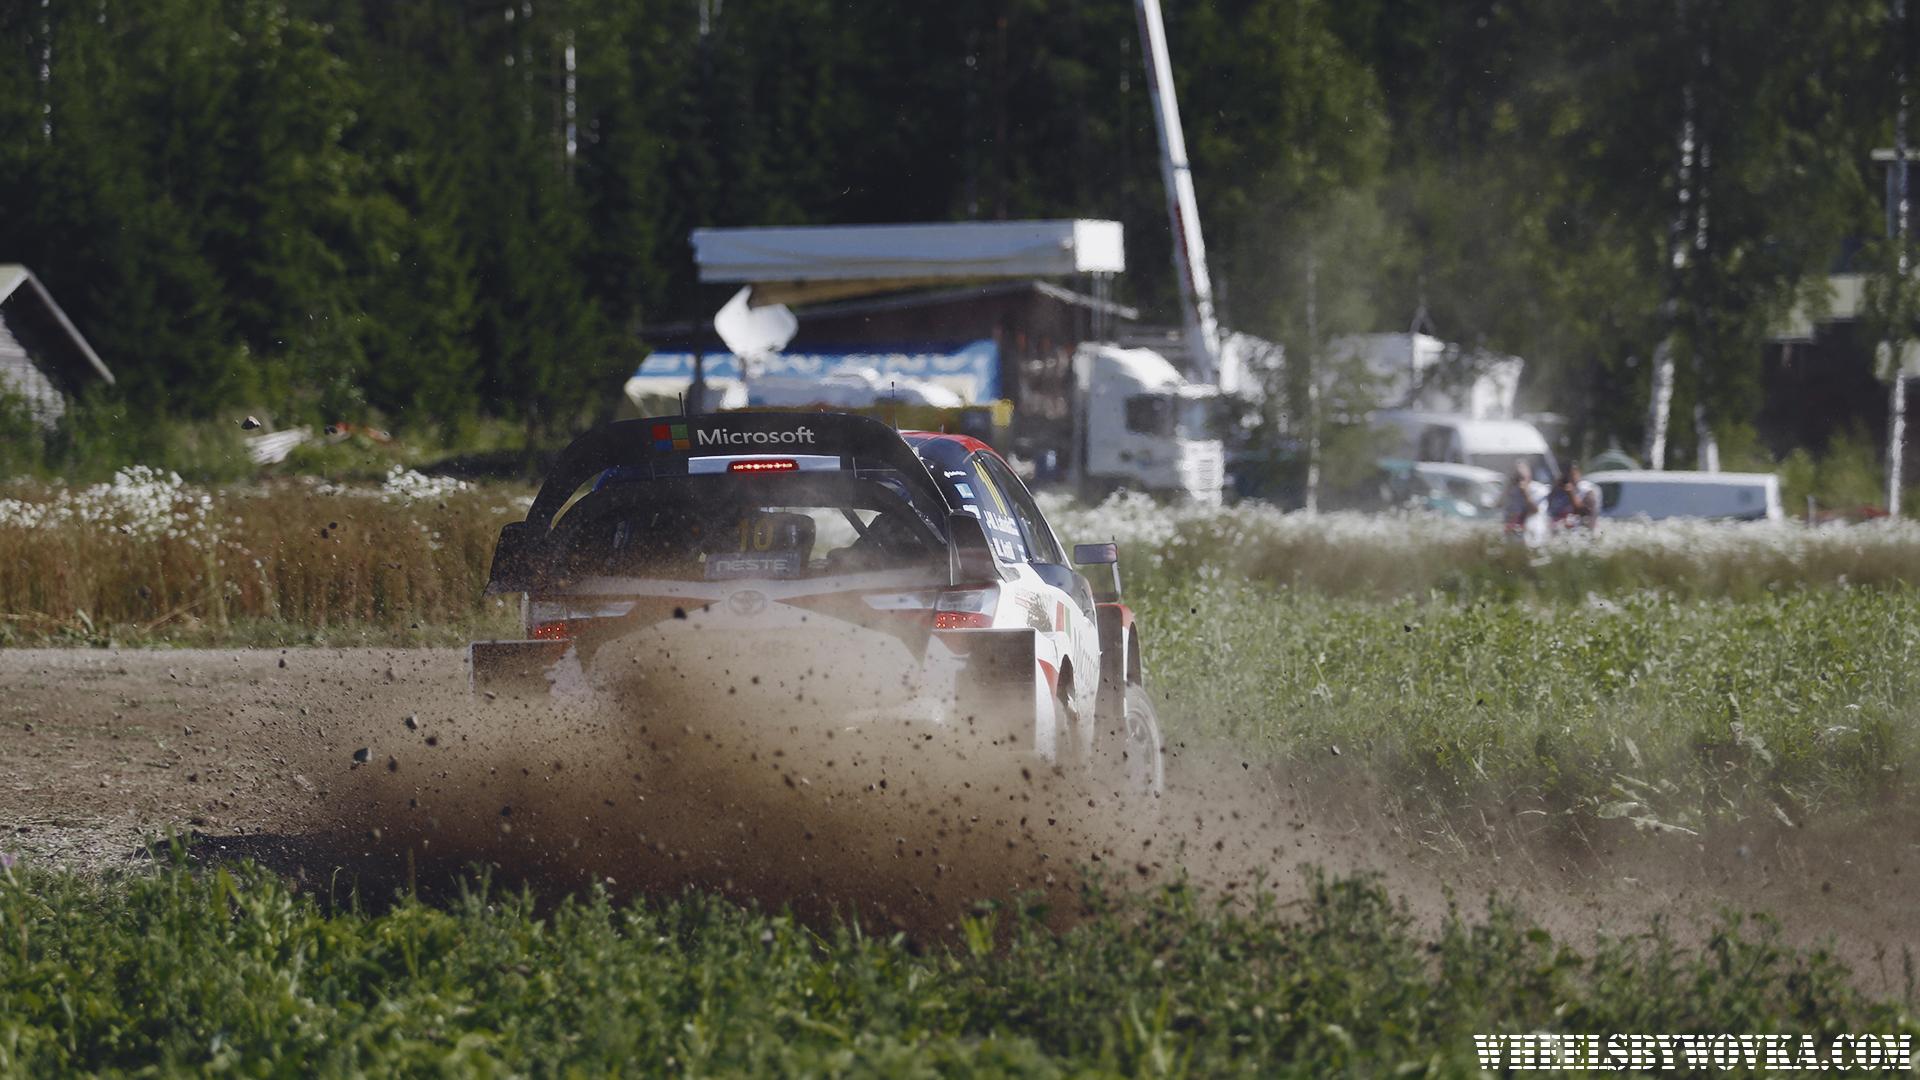 wrc-neste-rally-finalnd-2017-by-wheelsbywovka-20